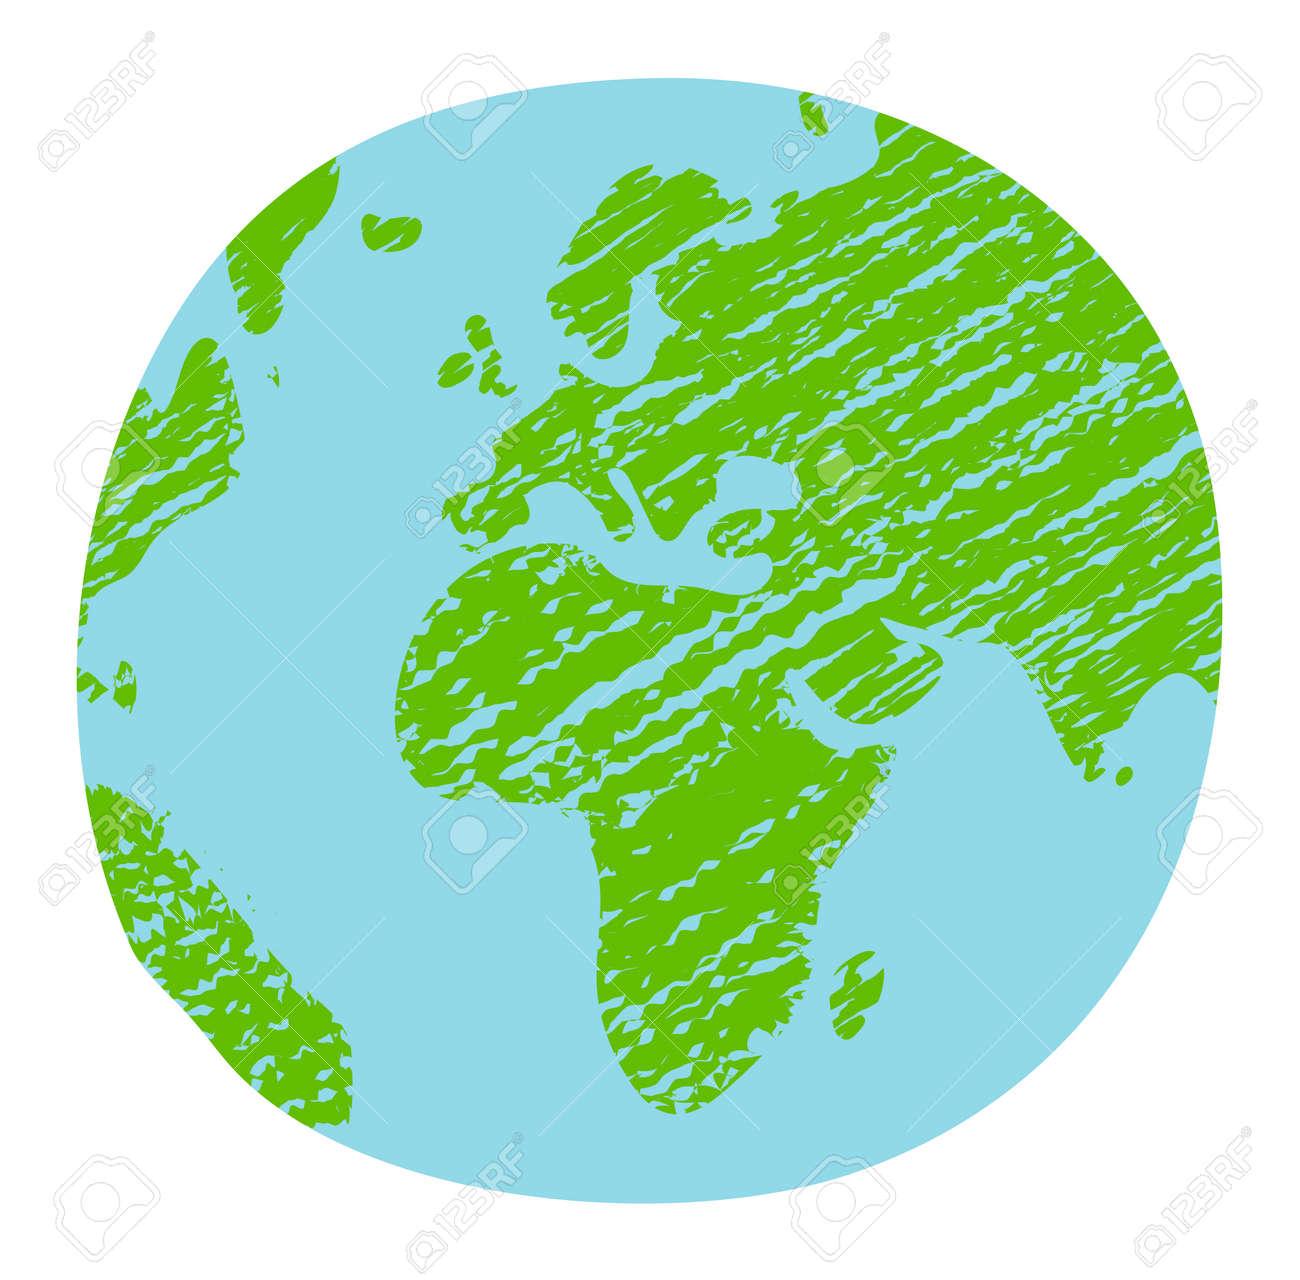 Chalked vector grunge earth (world map, globe) illustration - 169249620